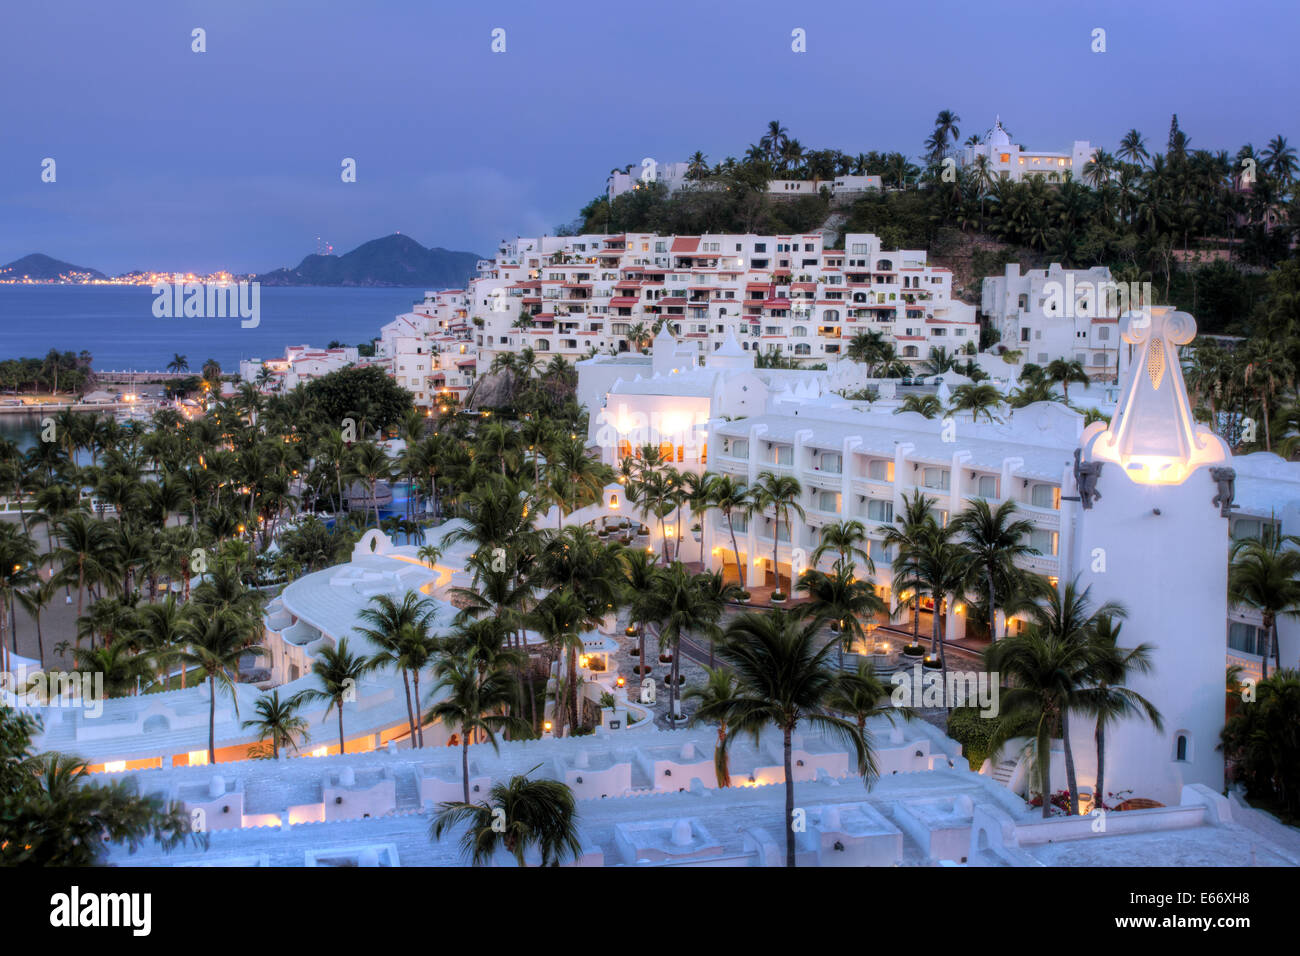 Resort Hotel Complex Of Las Hadas At Twilight In